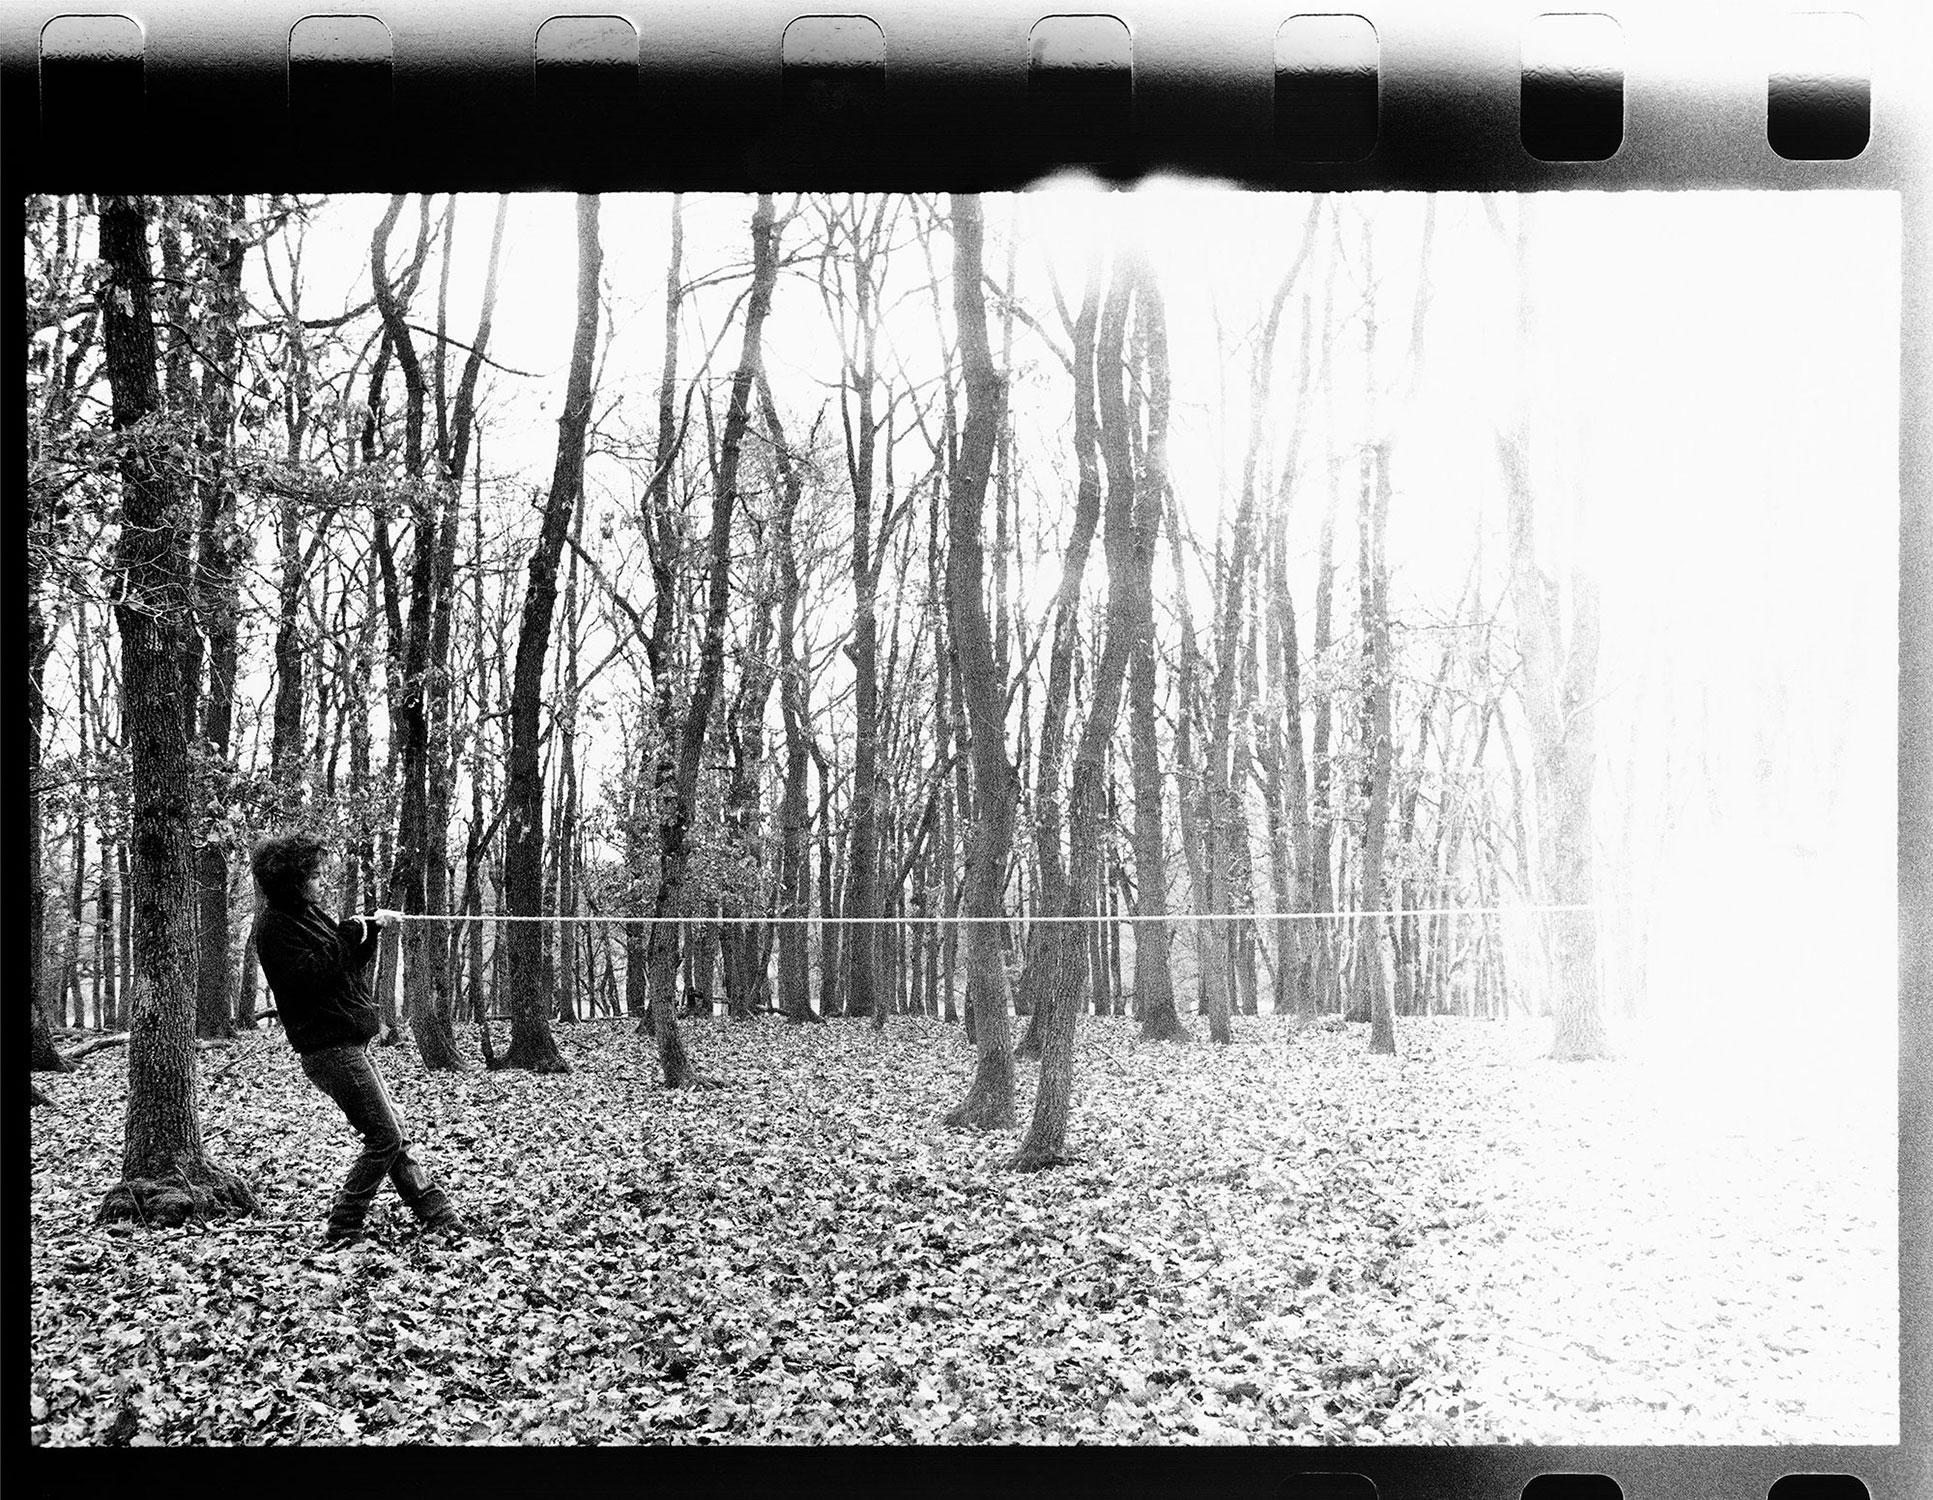 Mouna Karray, The Rope 1/4